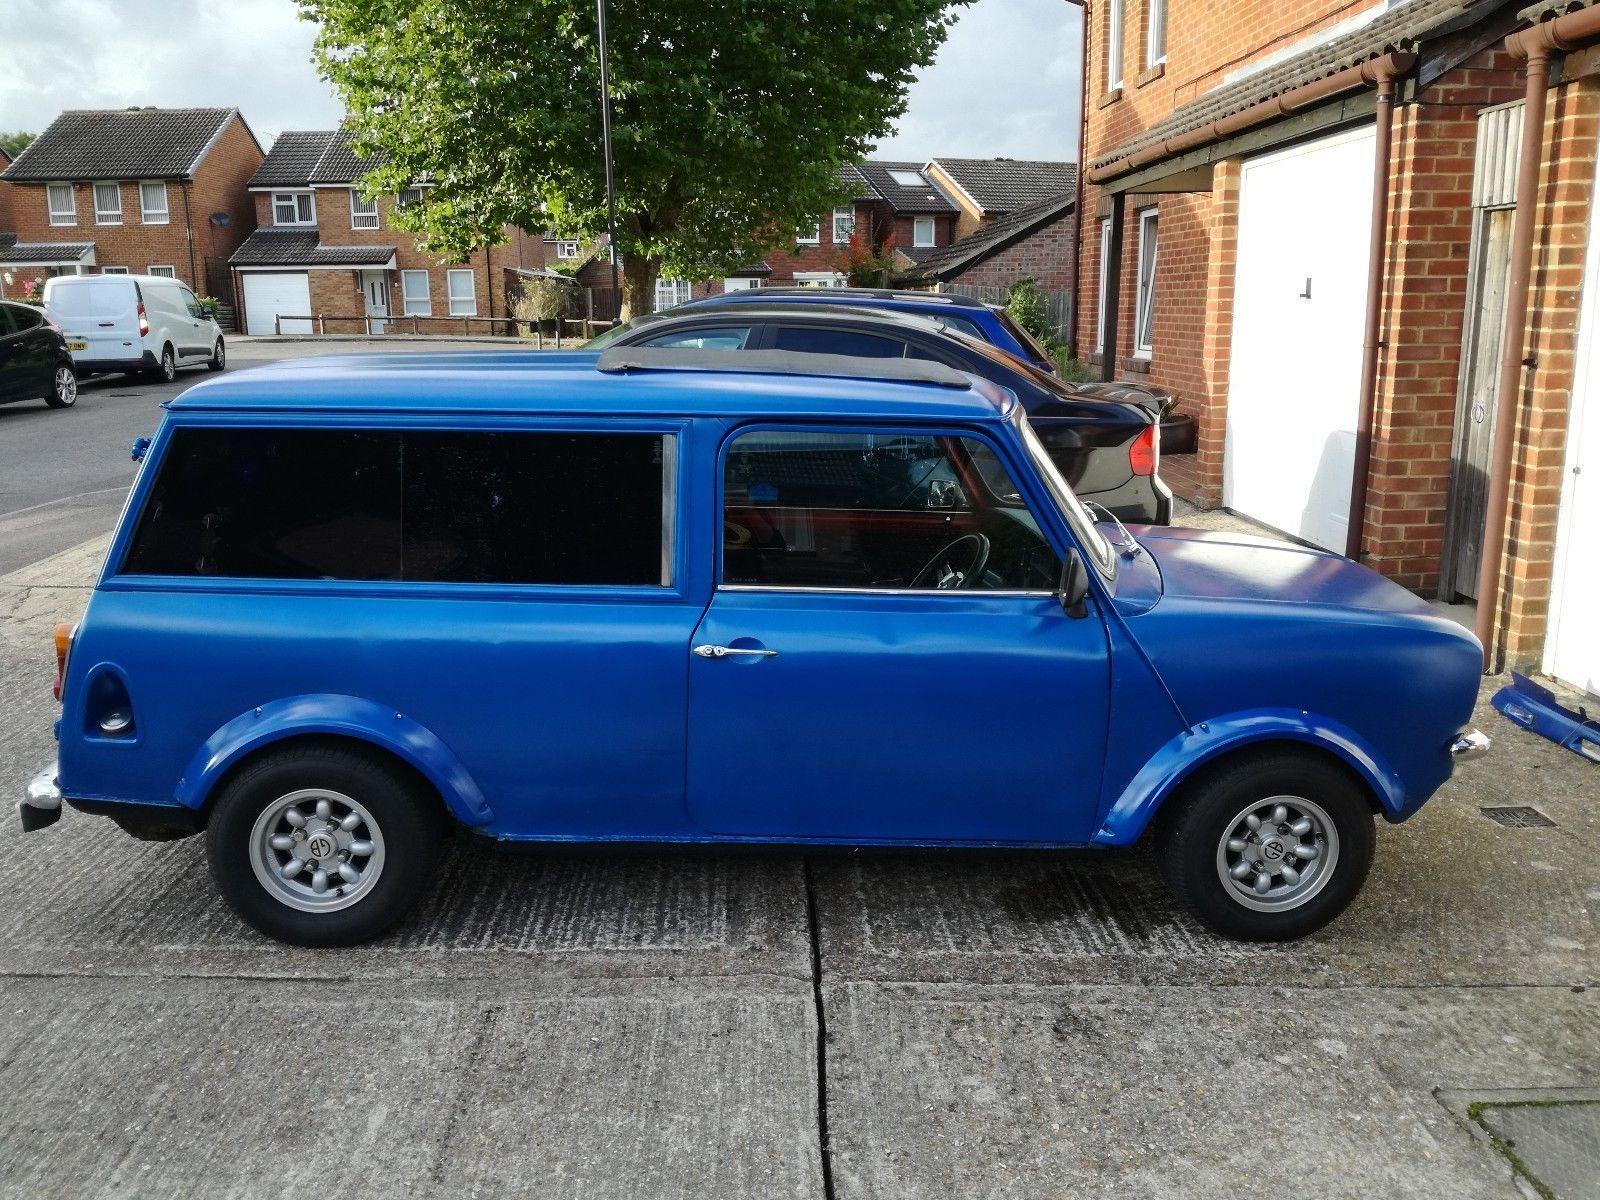 96e30608ae6 eBay: Classic mini clubman estate #classicmini #mini | UK Classic ...